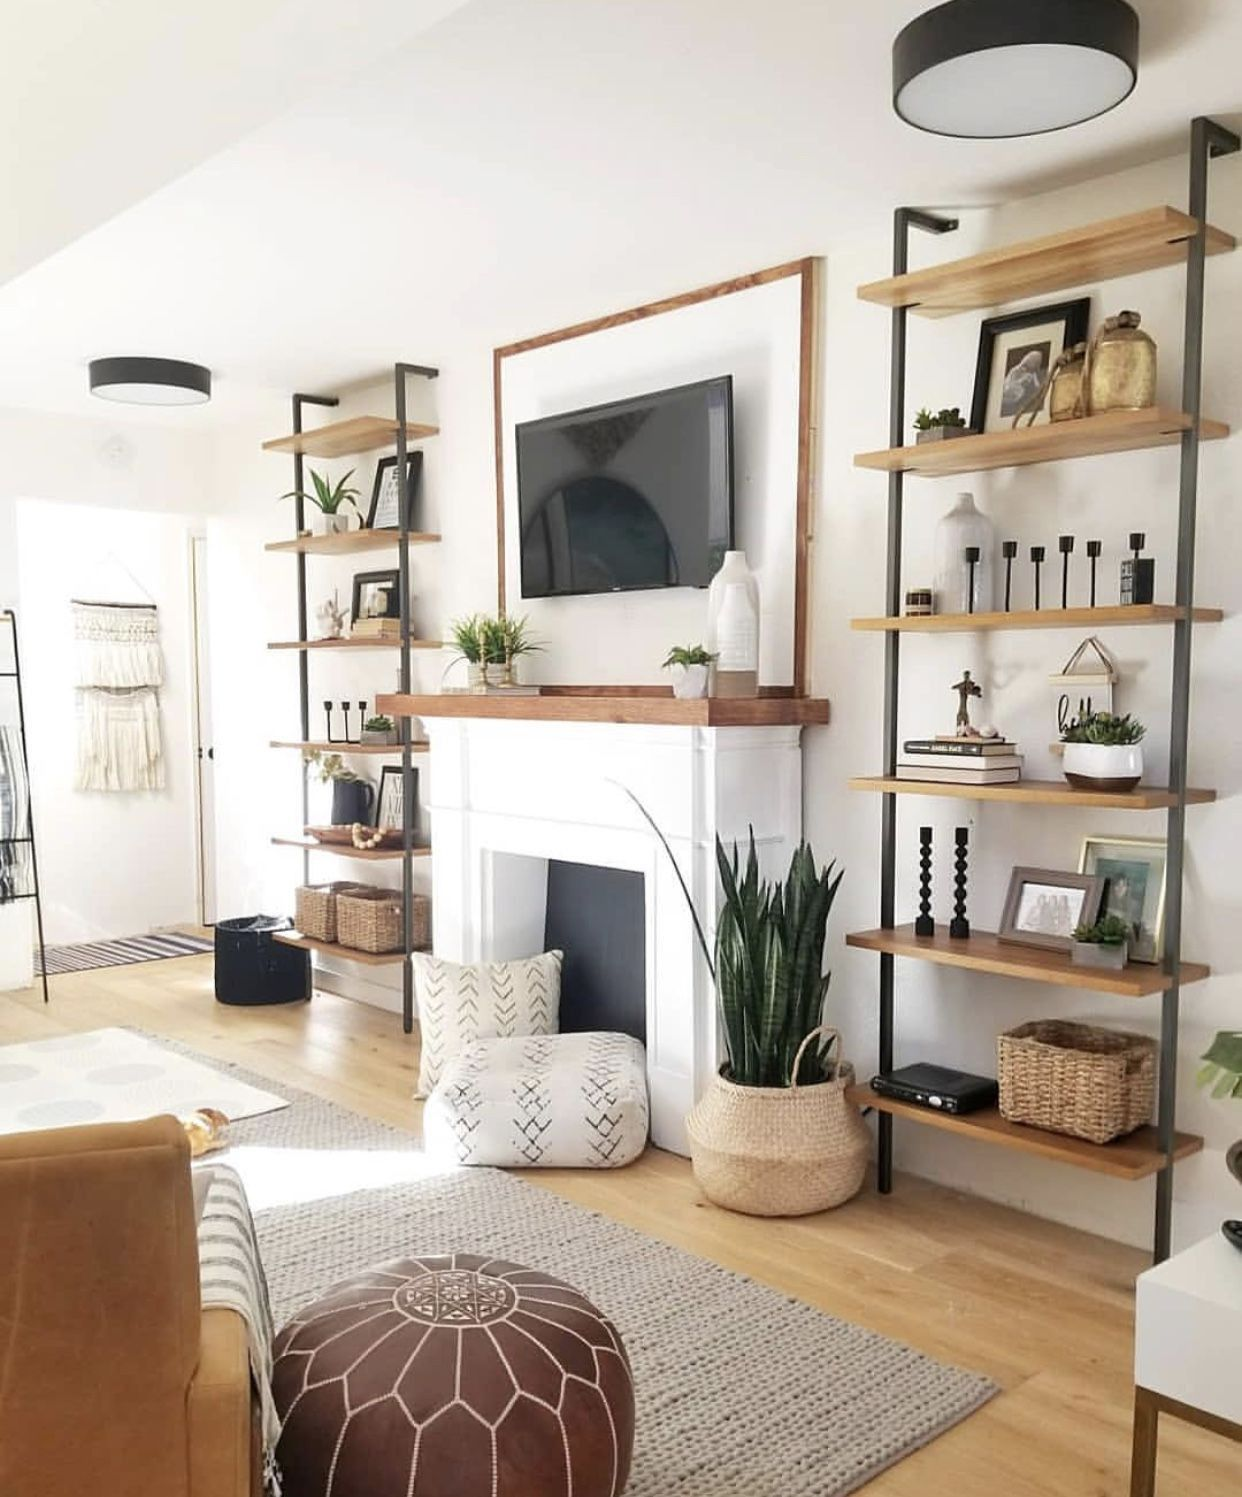 new mid century modern living room ideas diy 44 mid